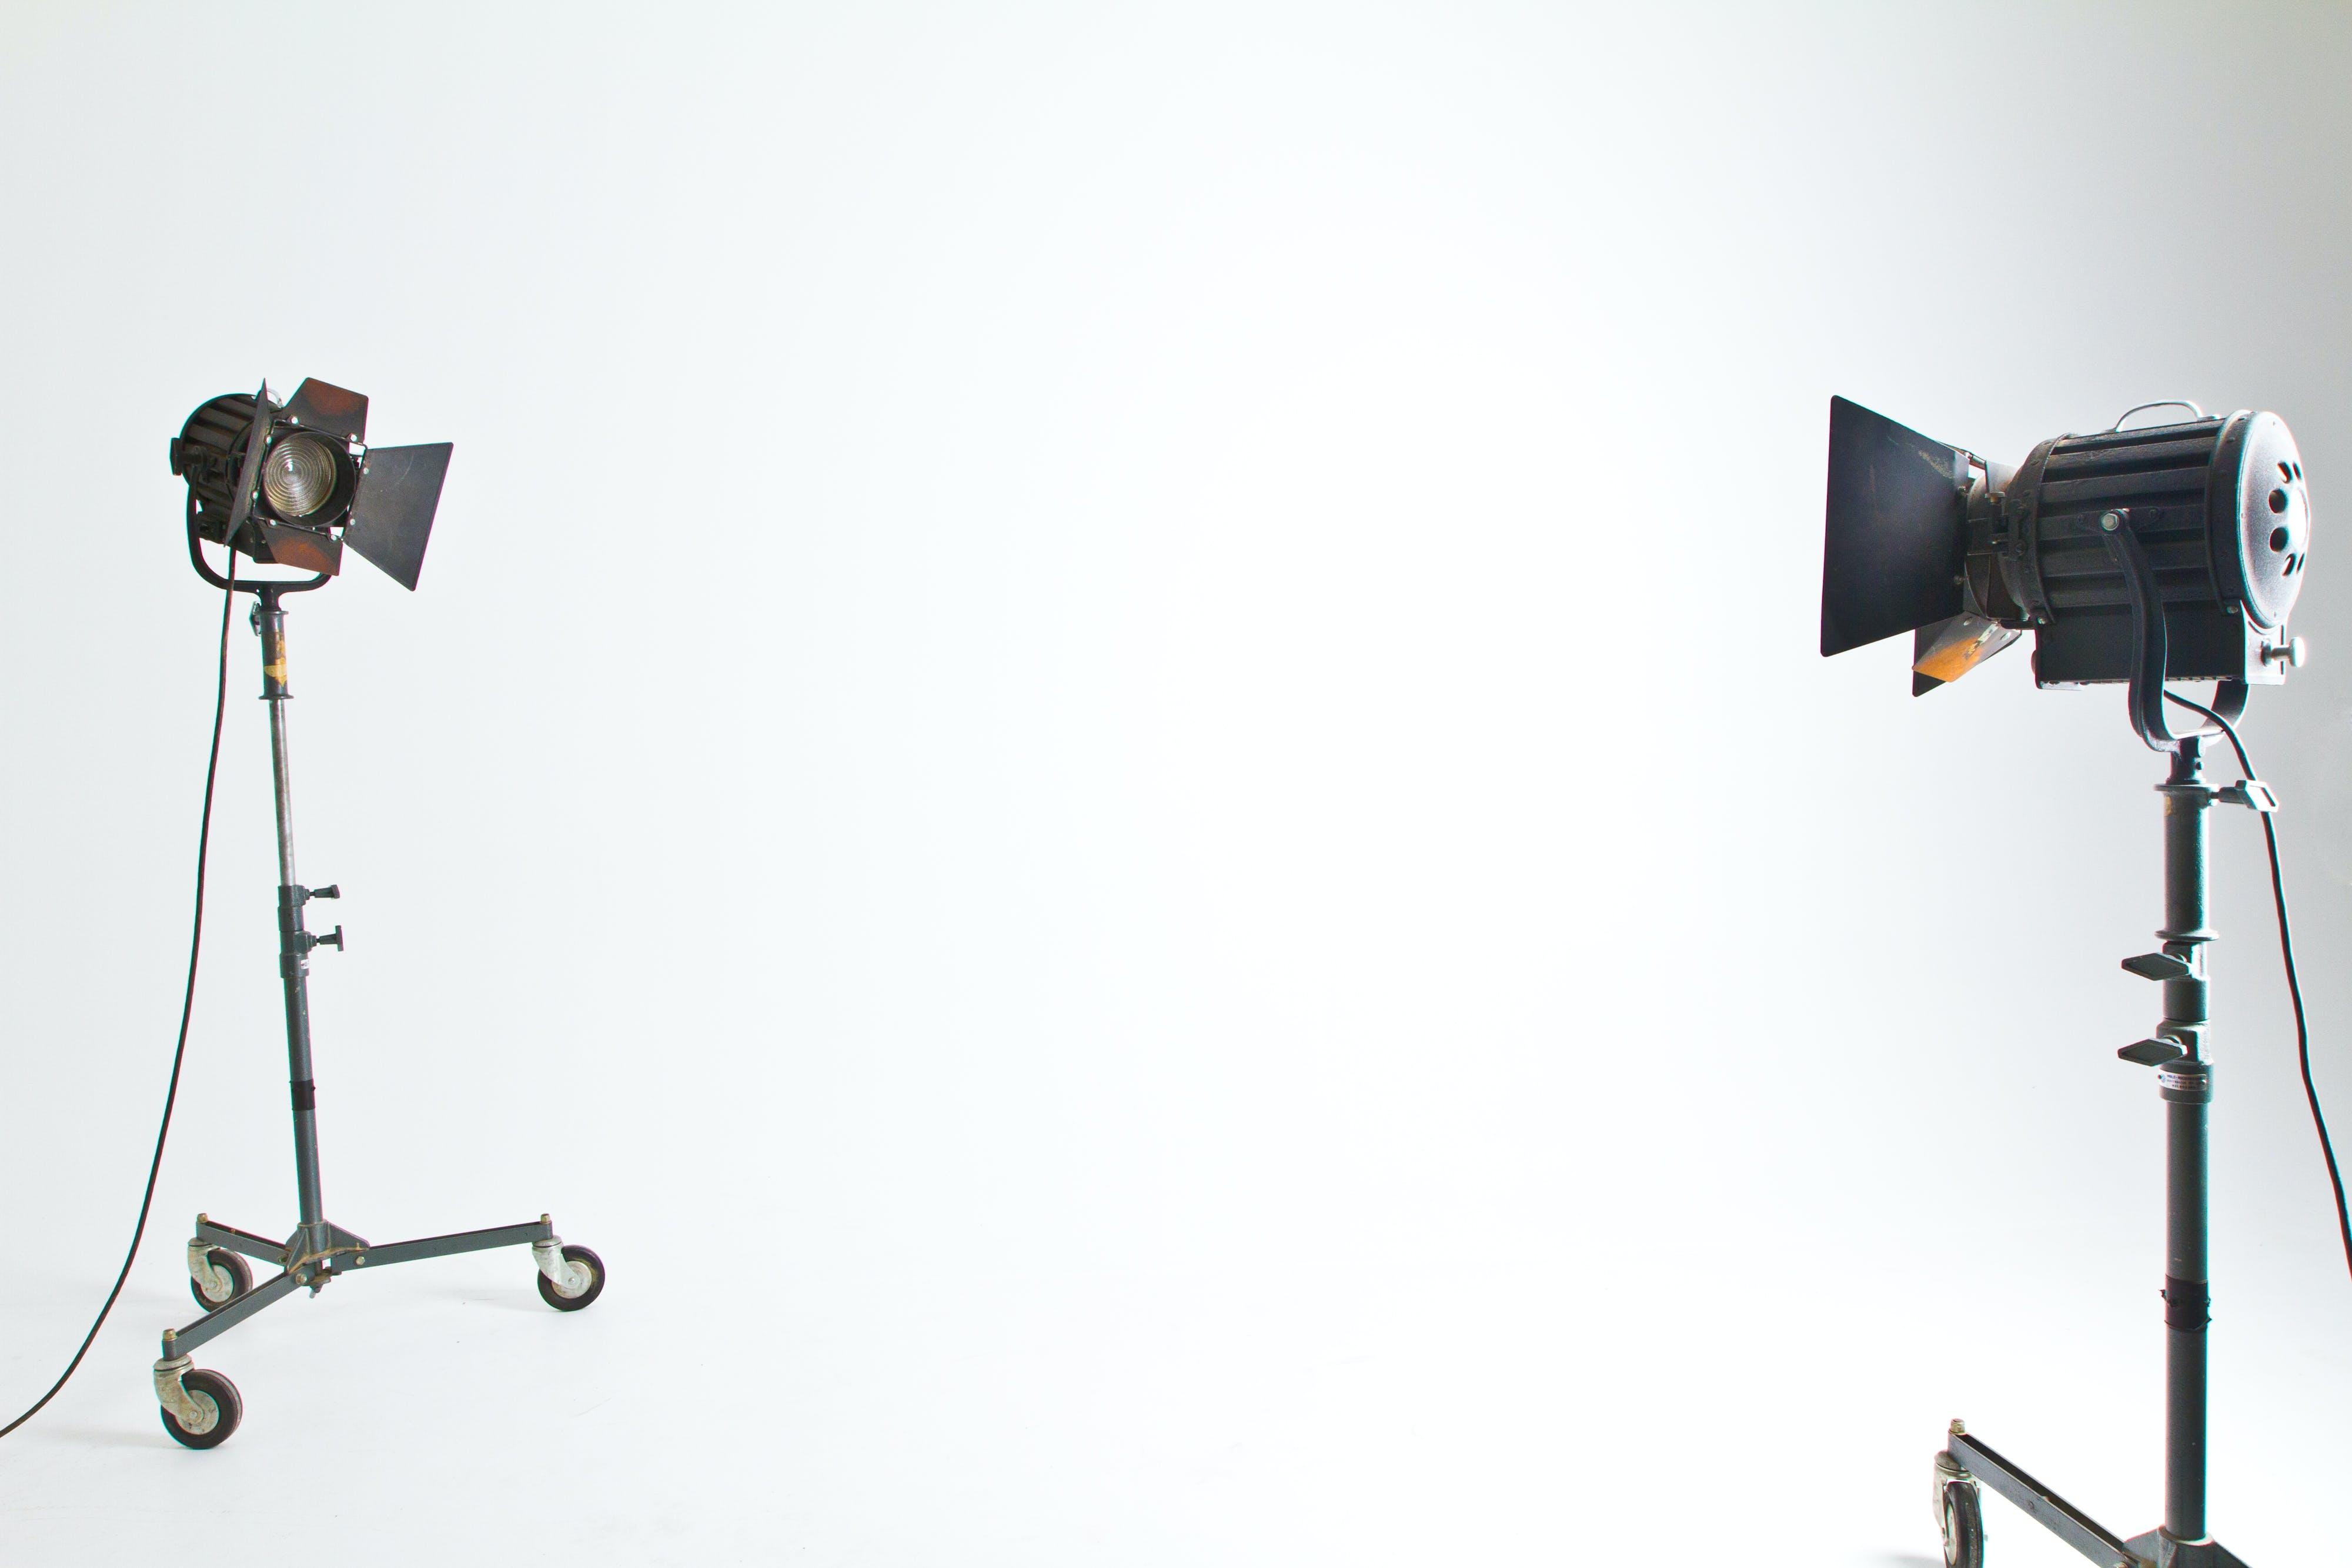 Gratis stockfoto met backdrop, belicht, fase, fel